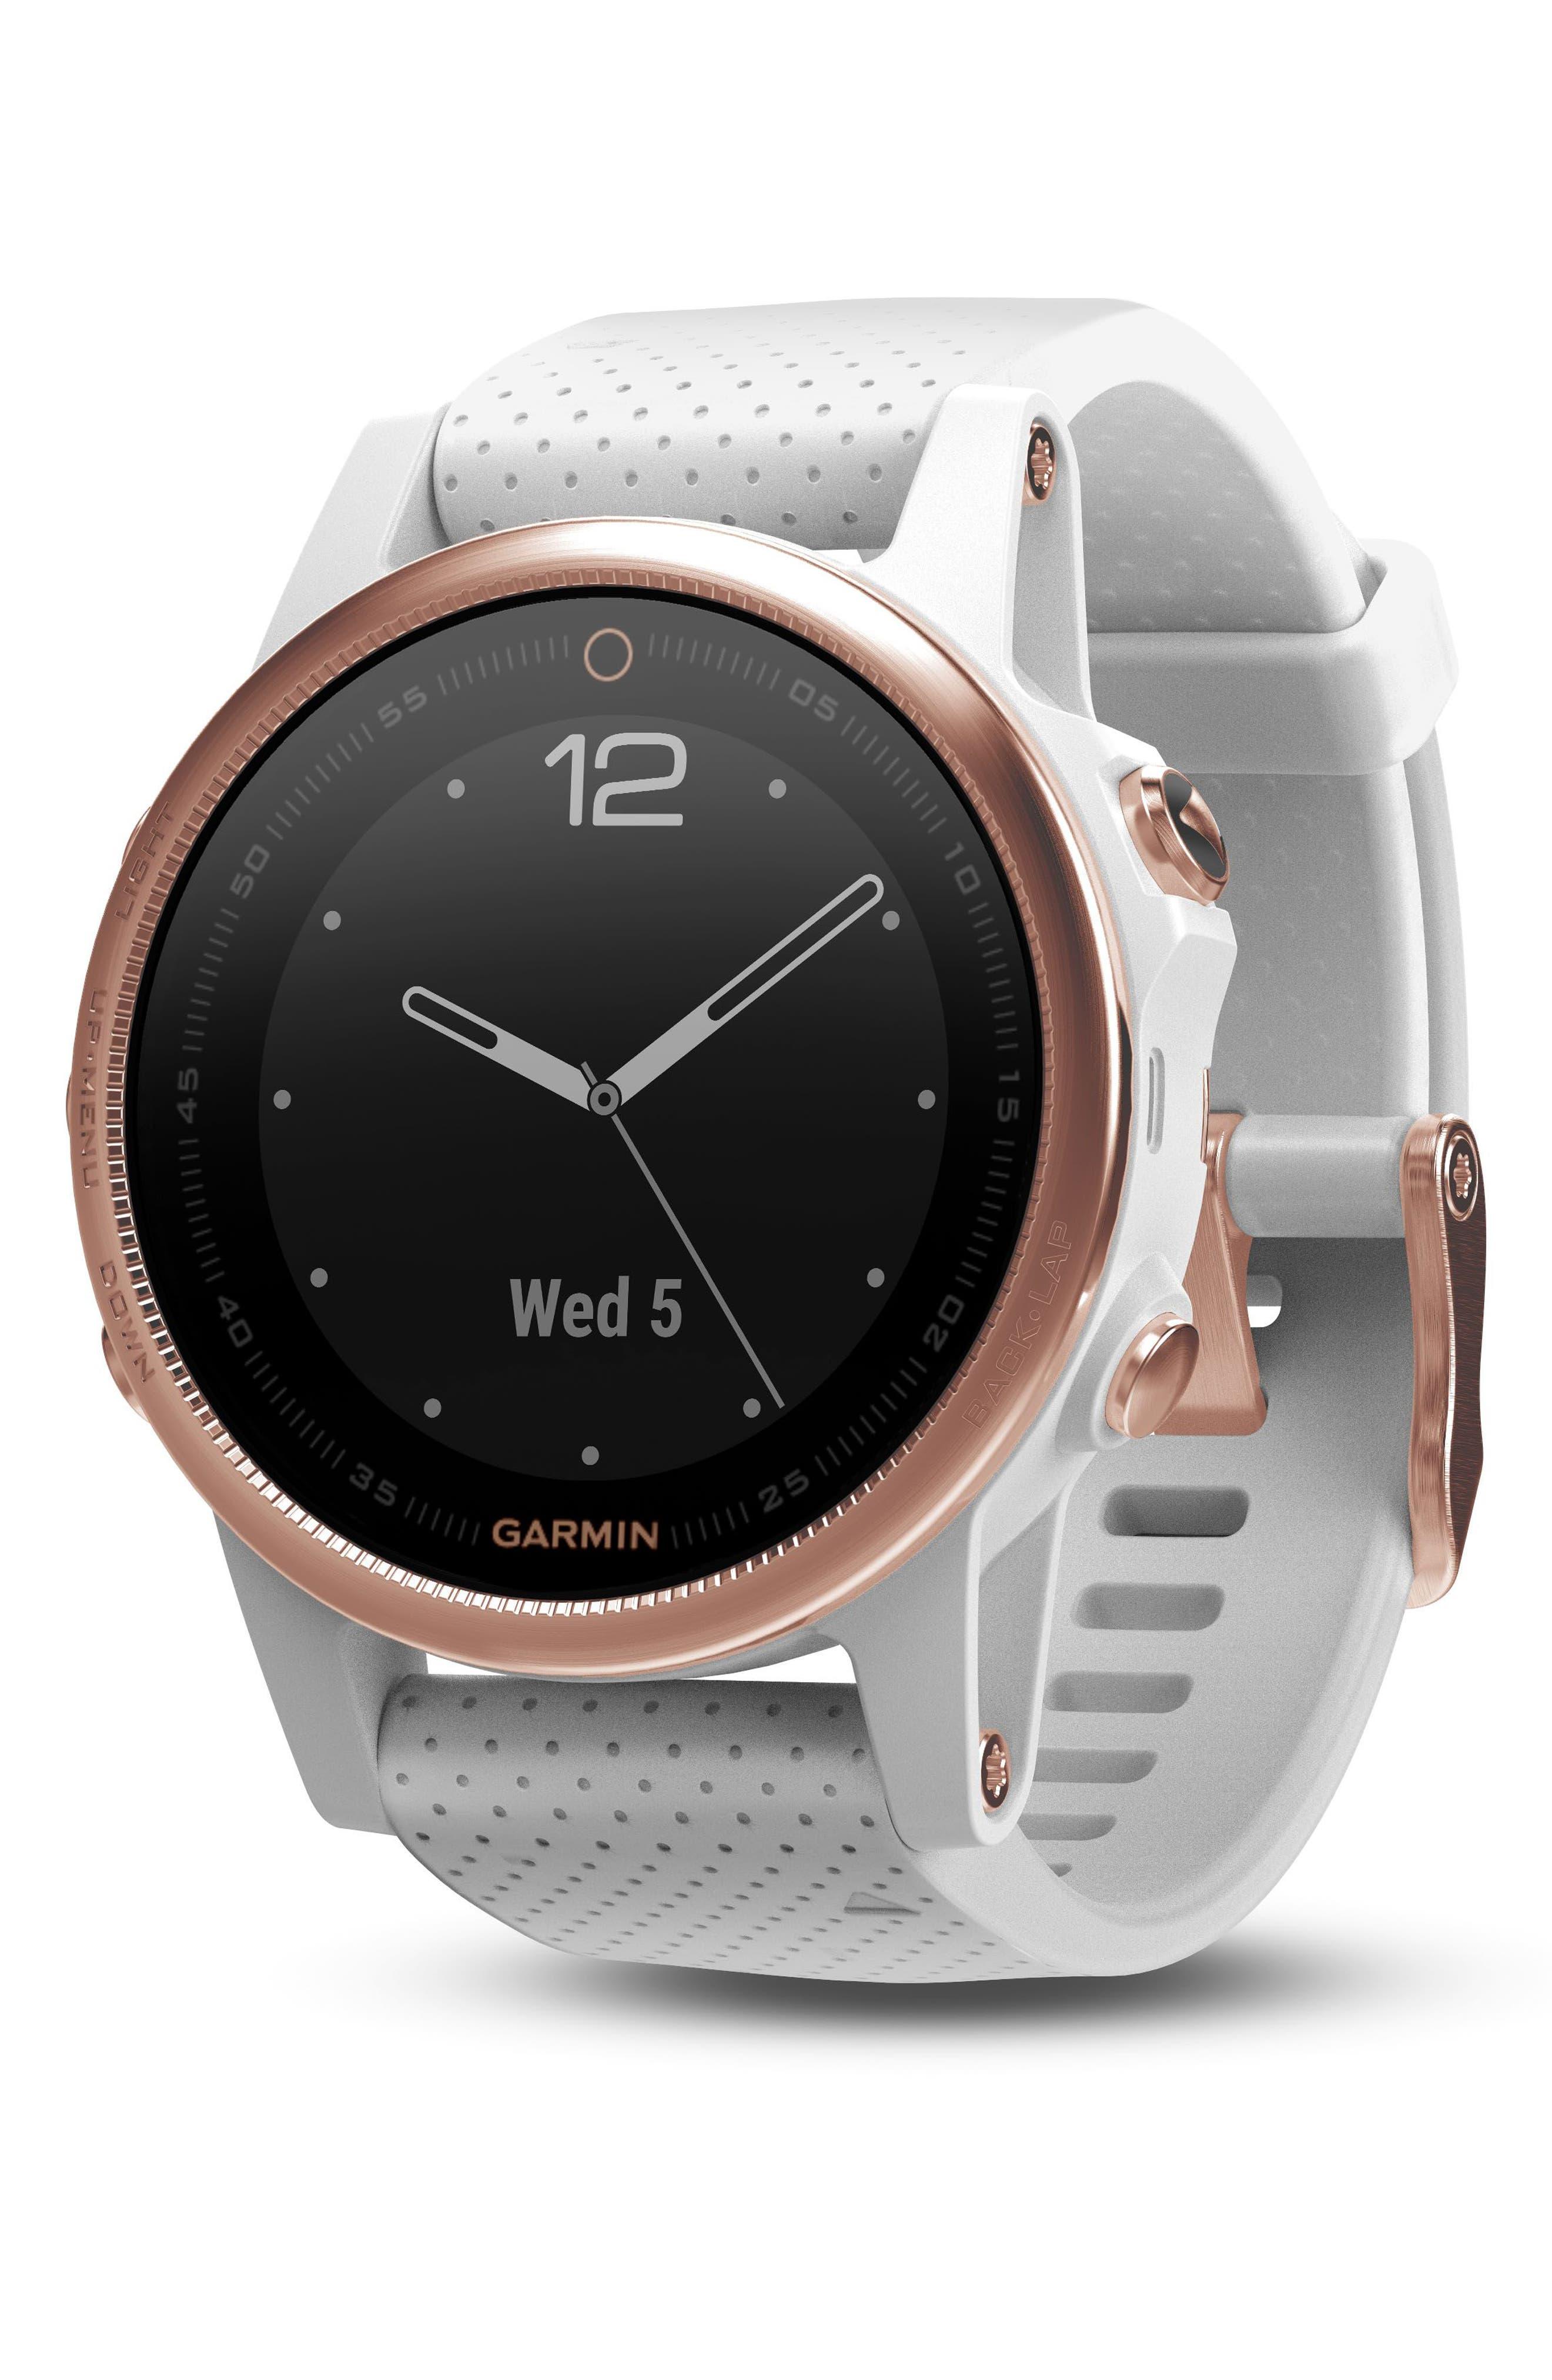 GARMIN fenix<sup>®</sup> 5S Sapphire Premium Multisport GPS Watch, 42mm, Main, color, WHITE/ ROSE GOLD SAPPHIRE